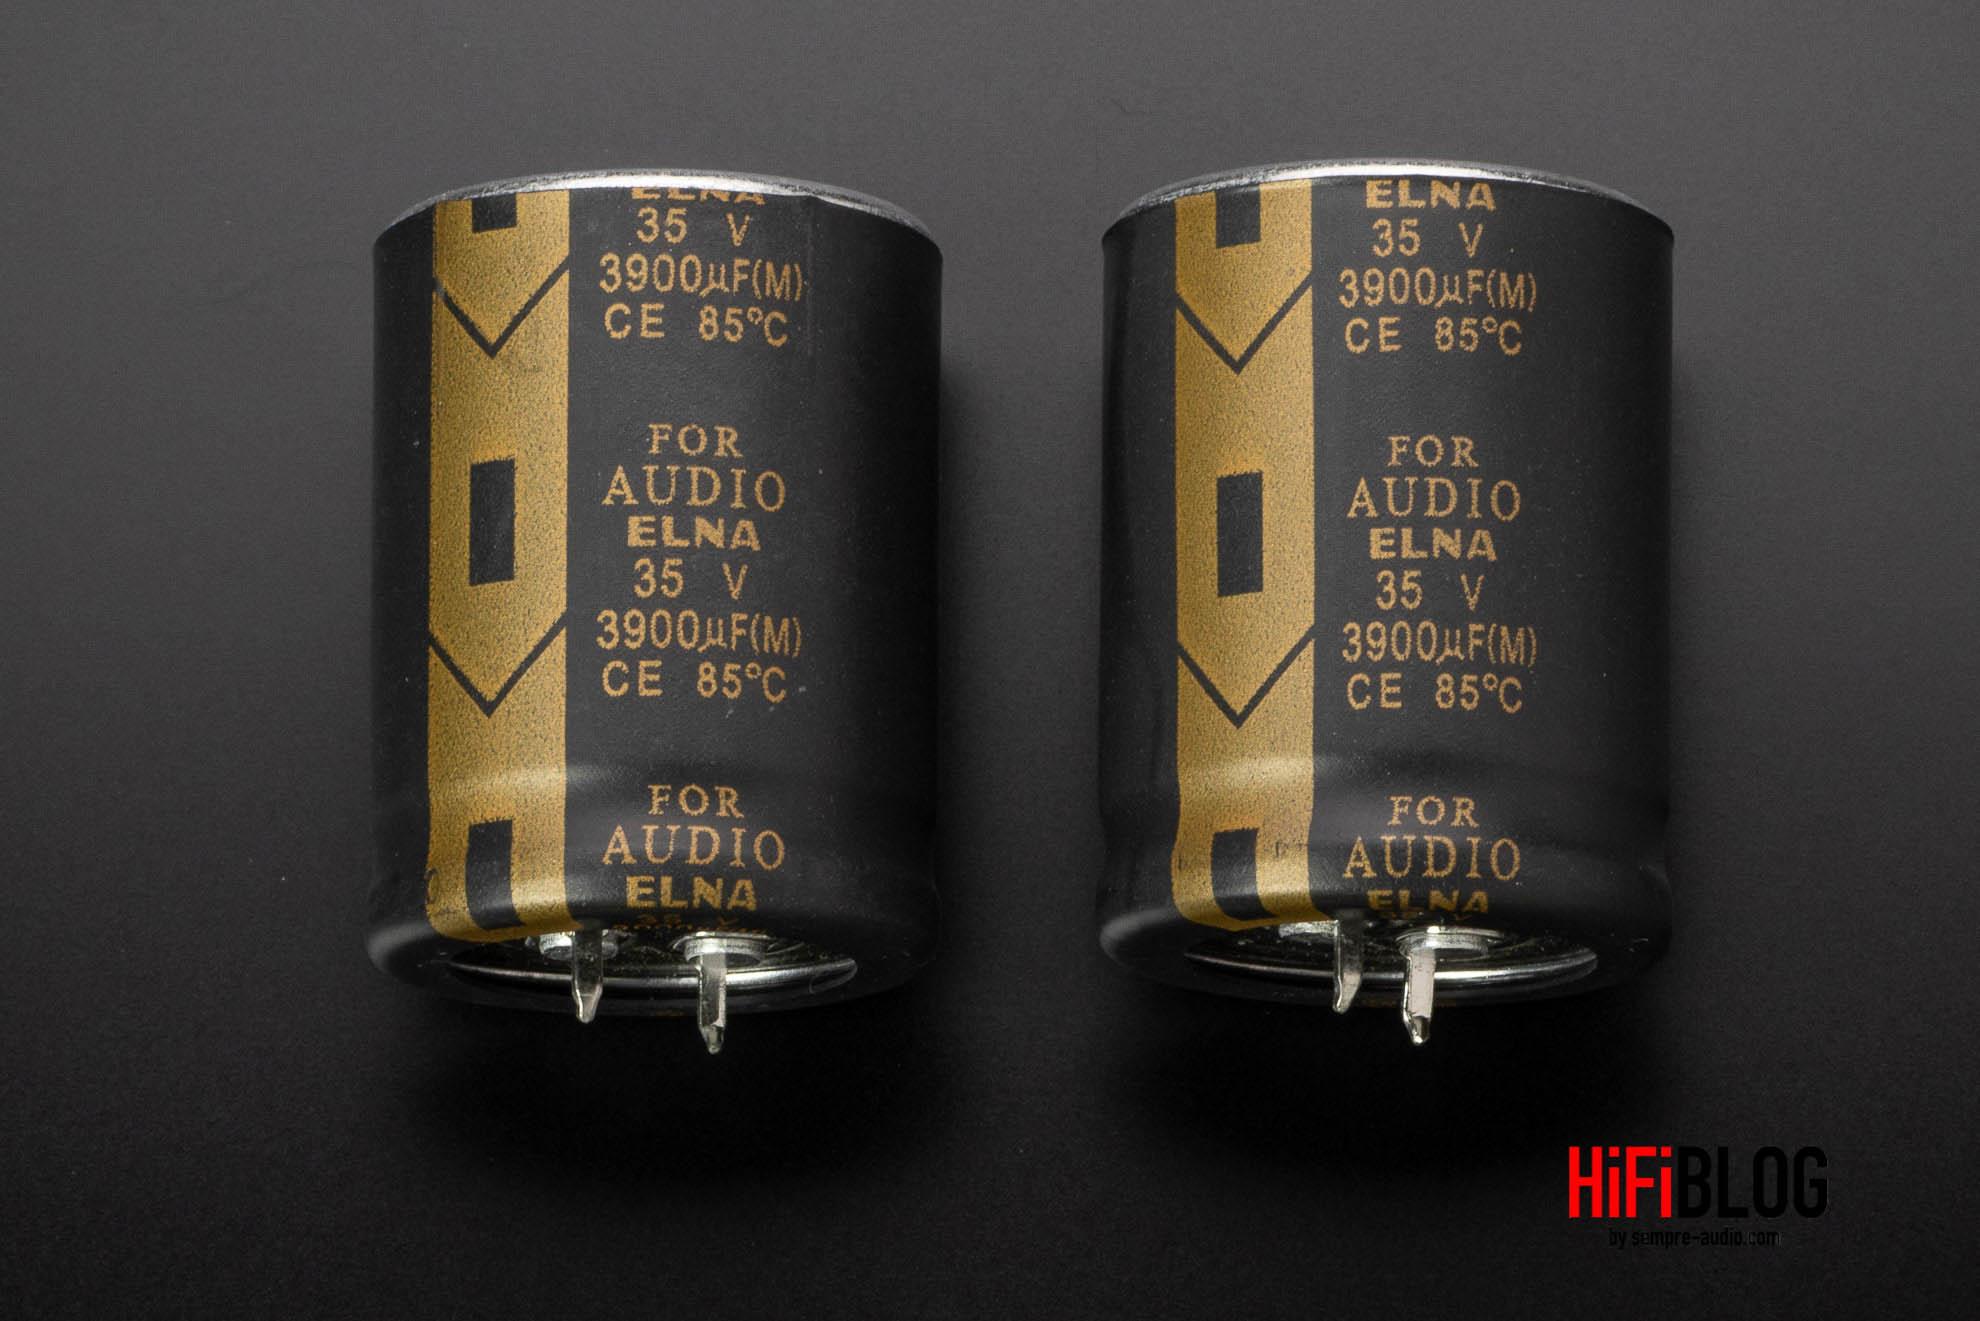 Marantz Model 30 Integrated Amplifier and SACD 30n Network SACD Player 69